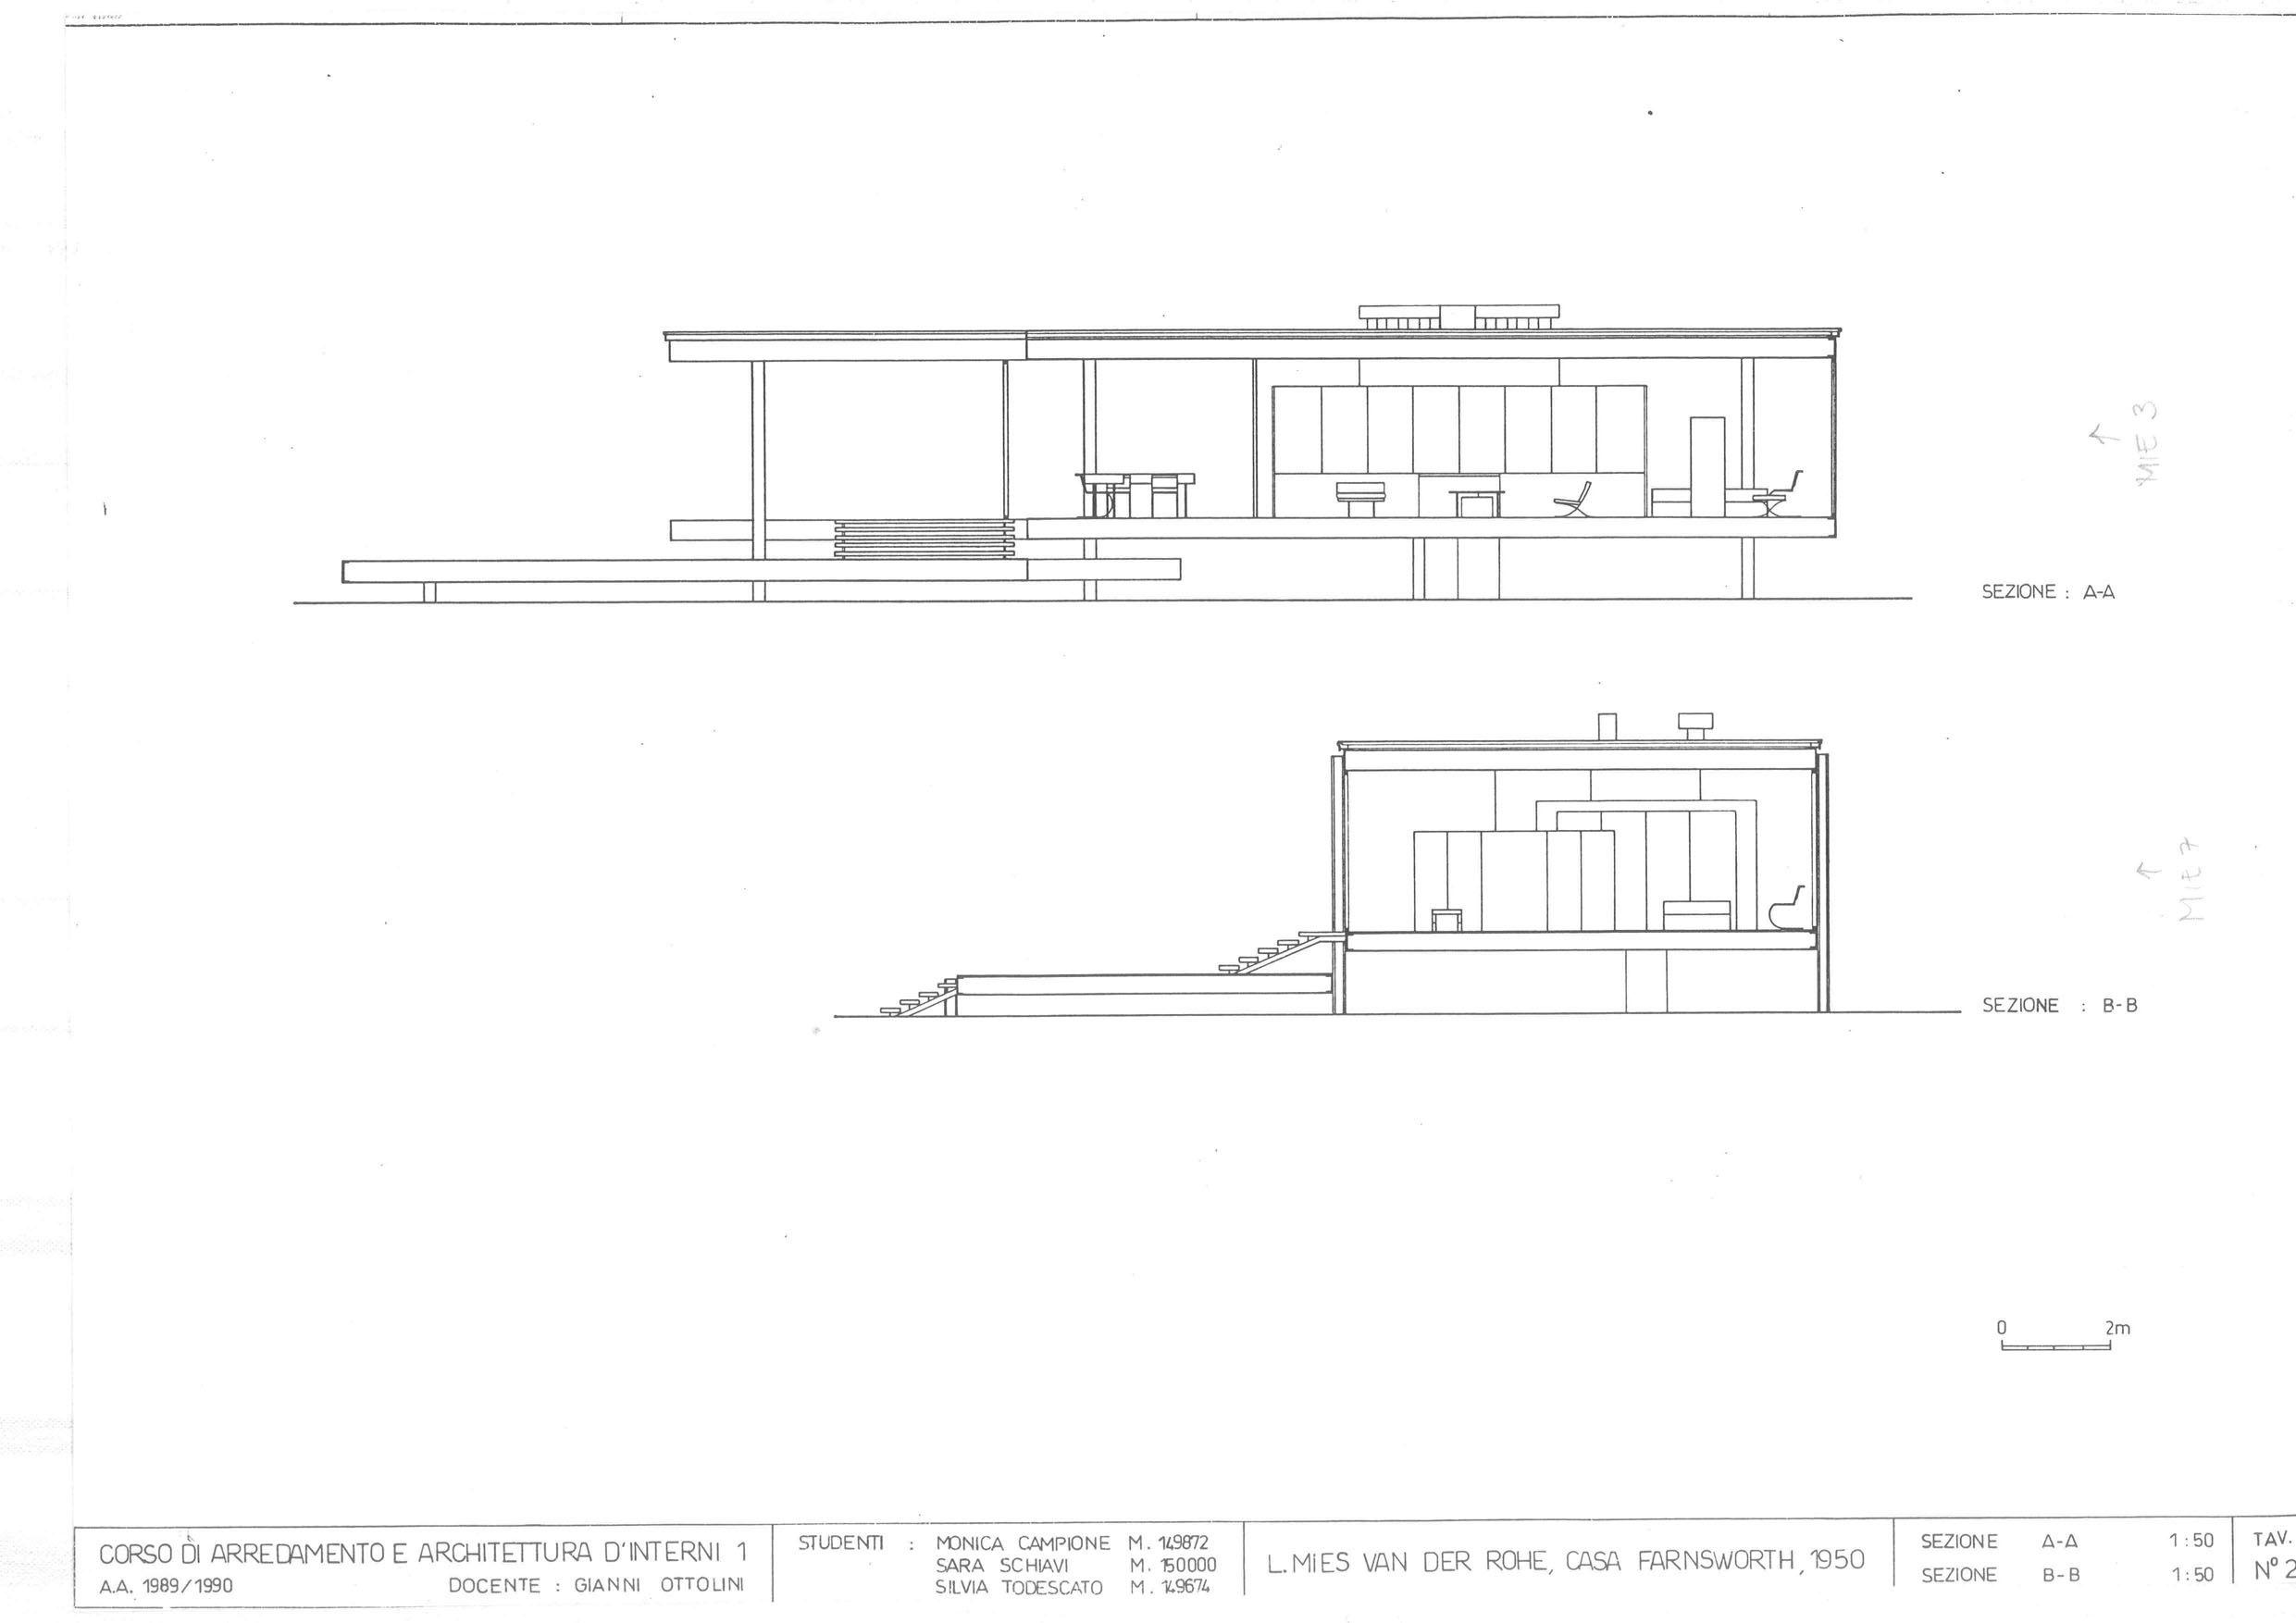 Farnsworth House Ludwig Mies Der Rohe mies der rohe farnsworth plan pesquisa ludwig mies